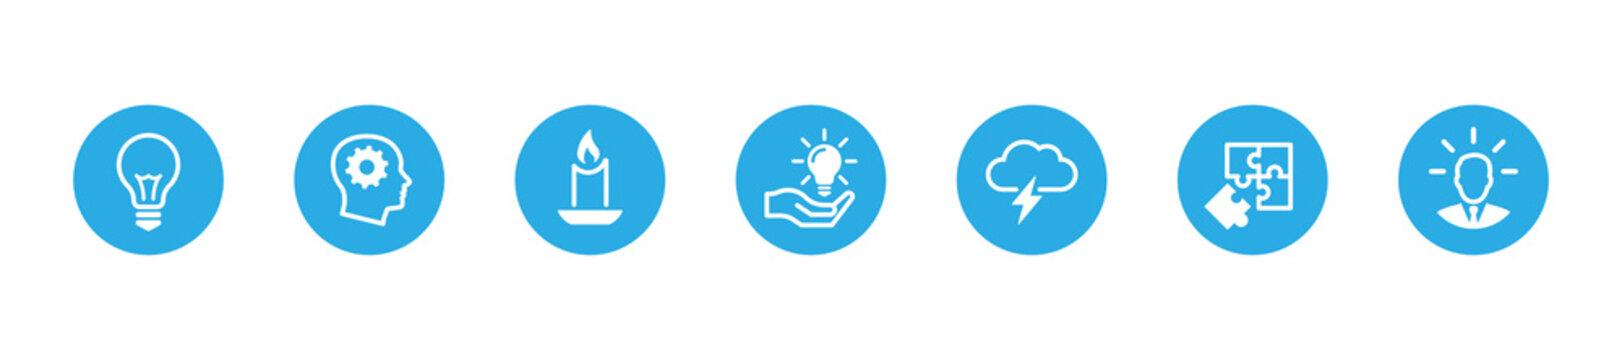 Idea icons set